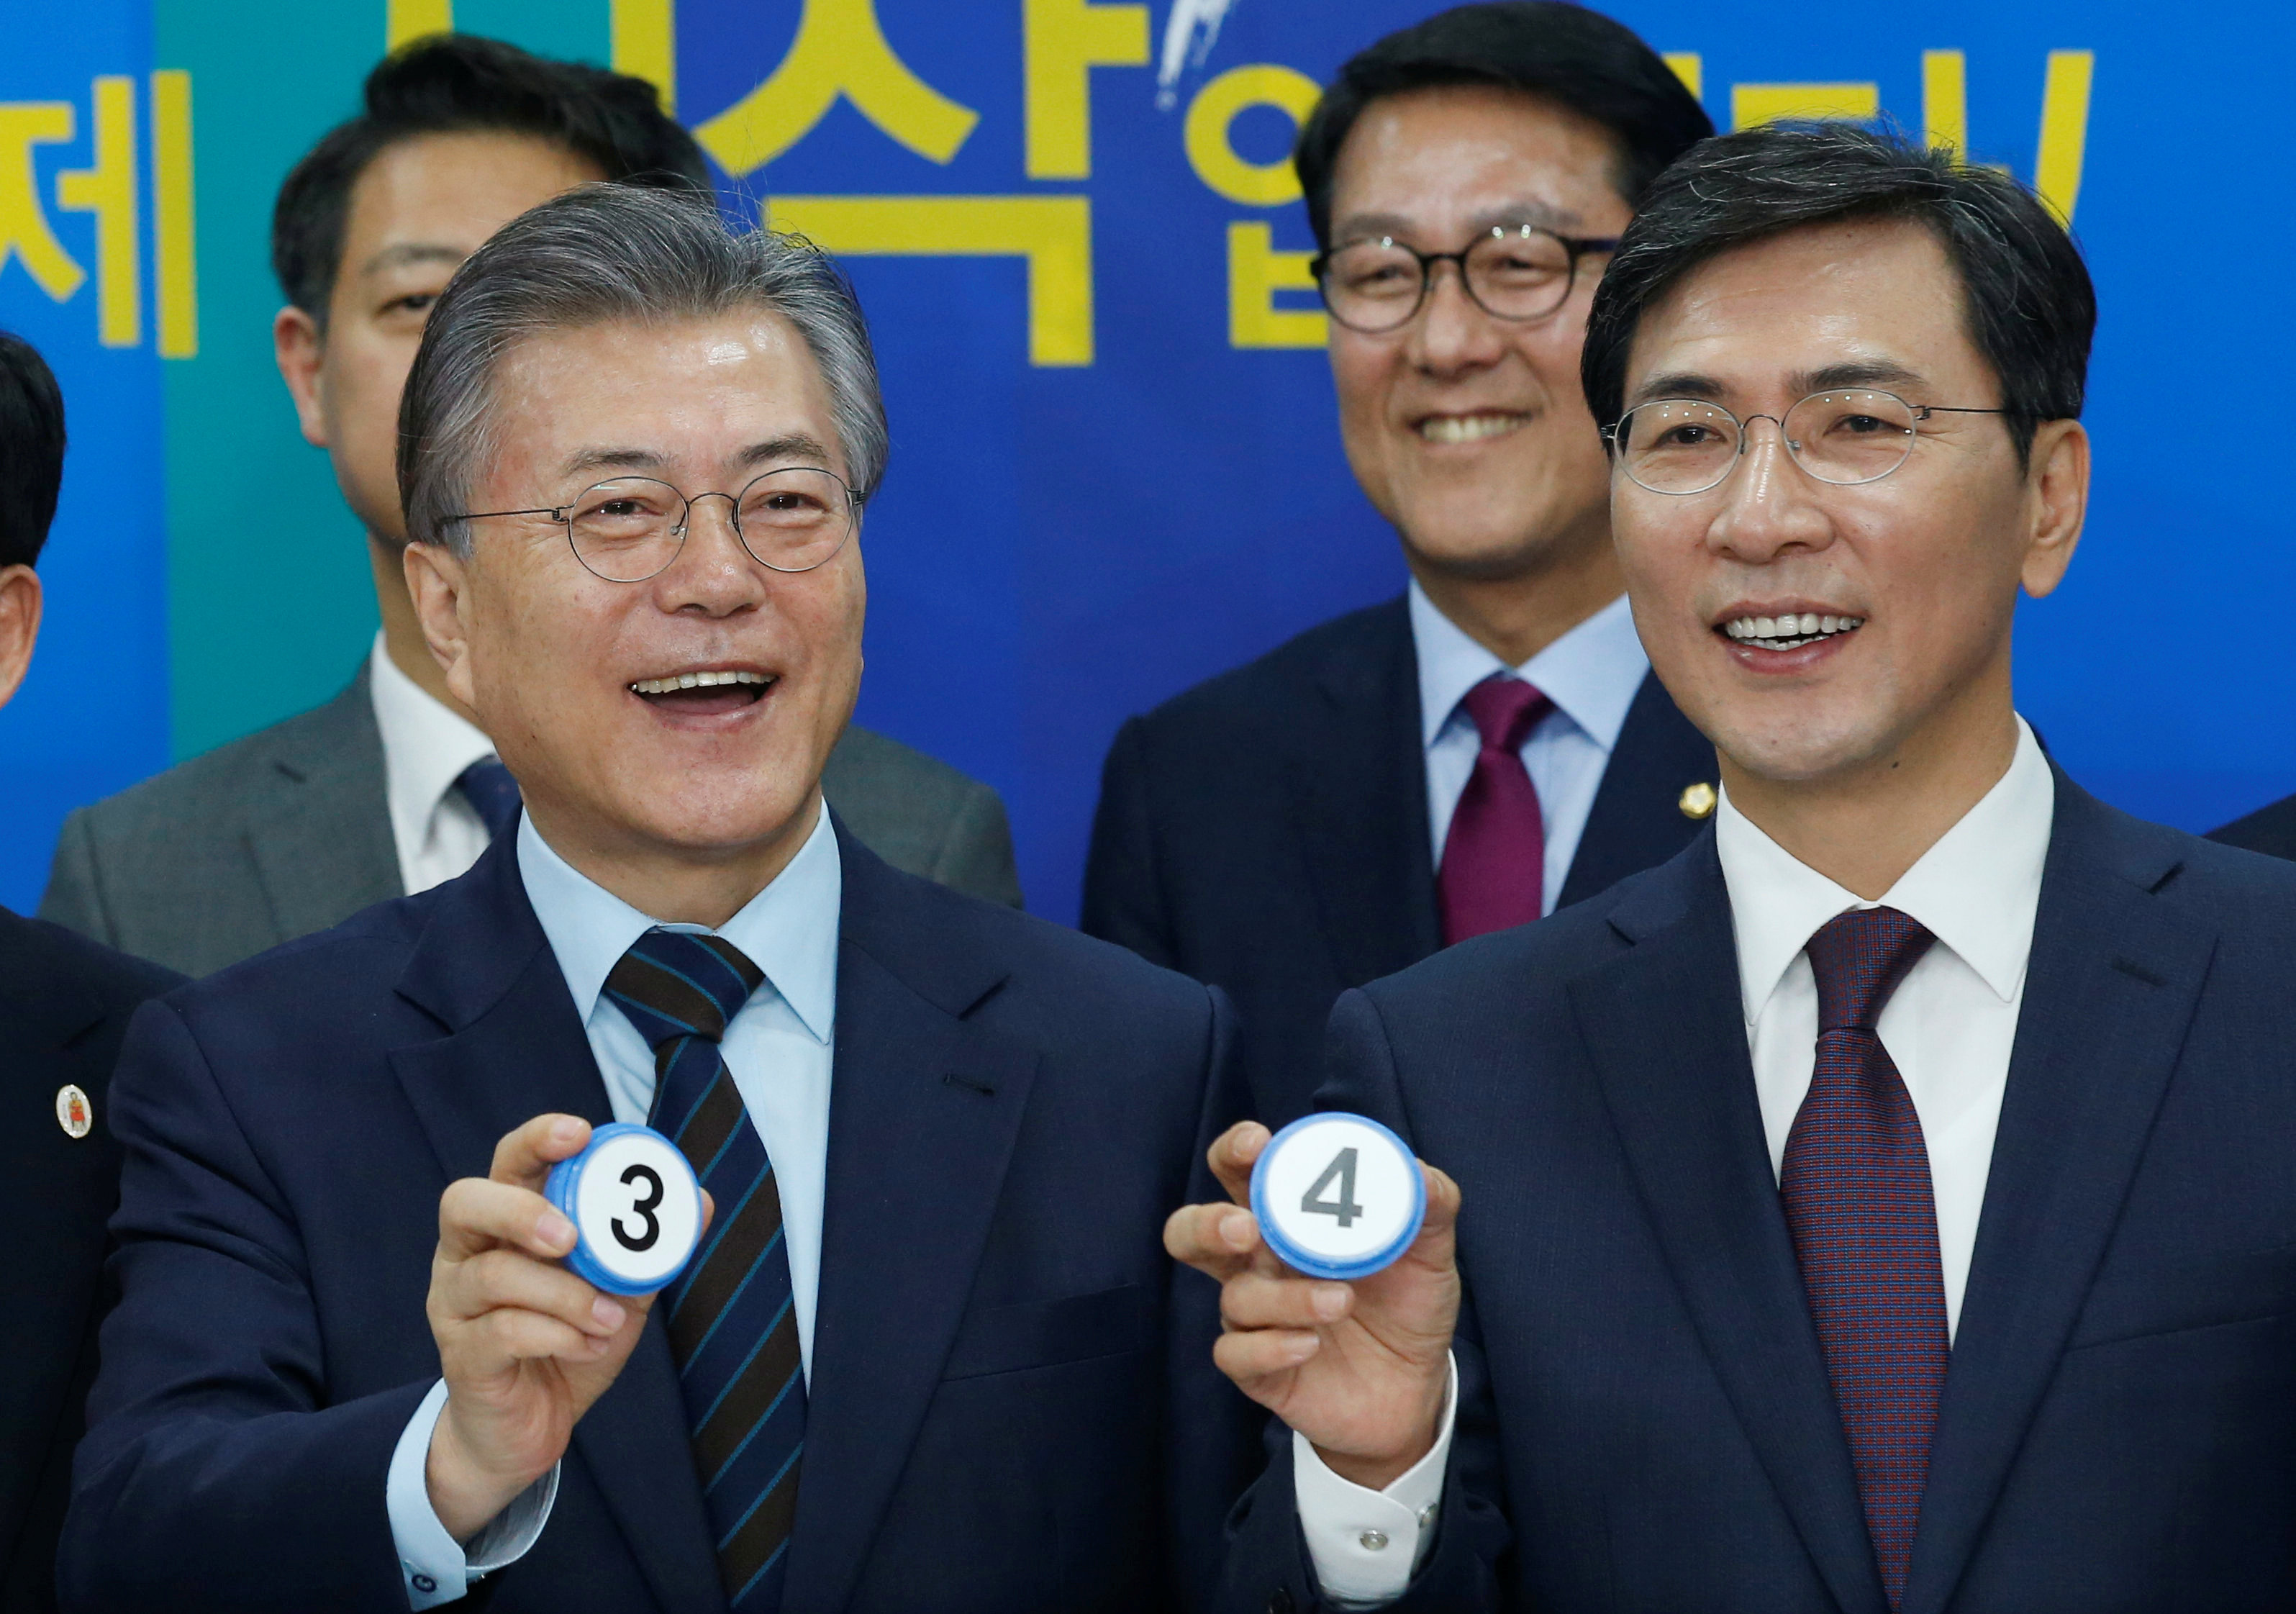 South Korean politician demands China stop retaliation over THAAD